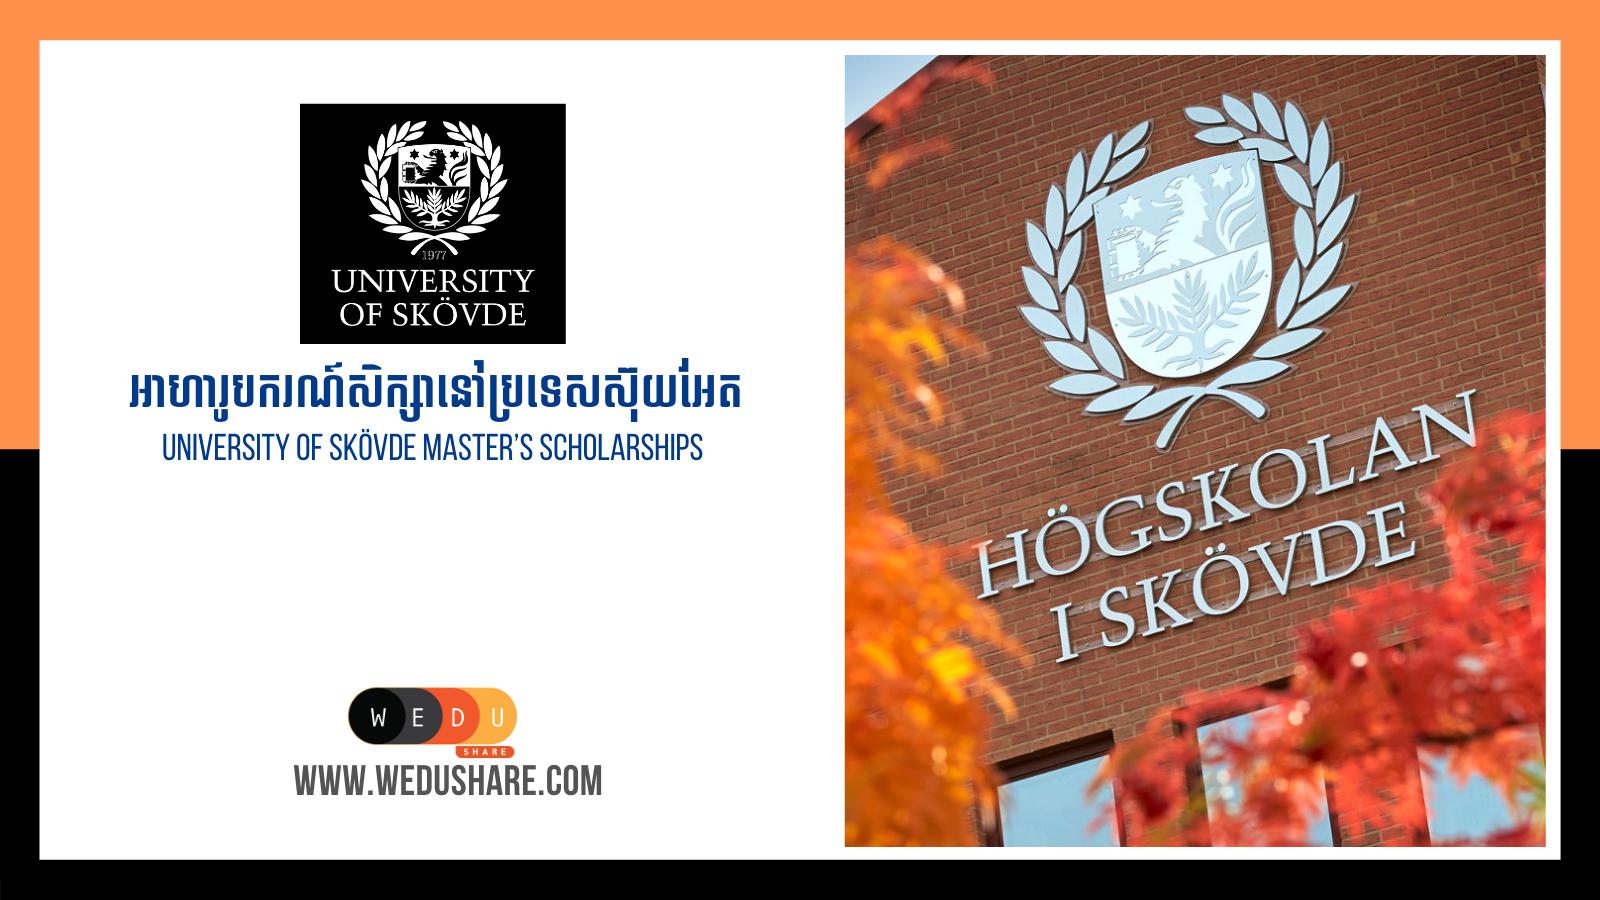 University of Skövde Master's Scholarships